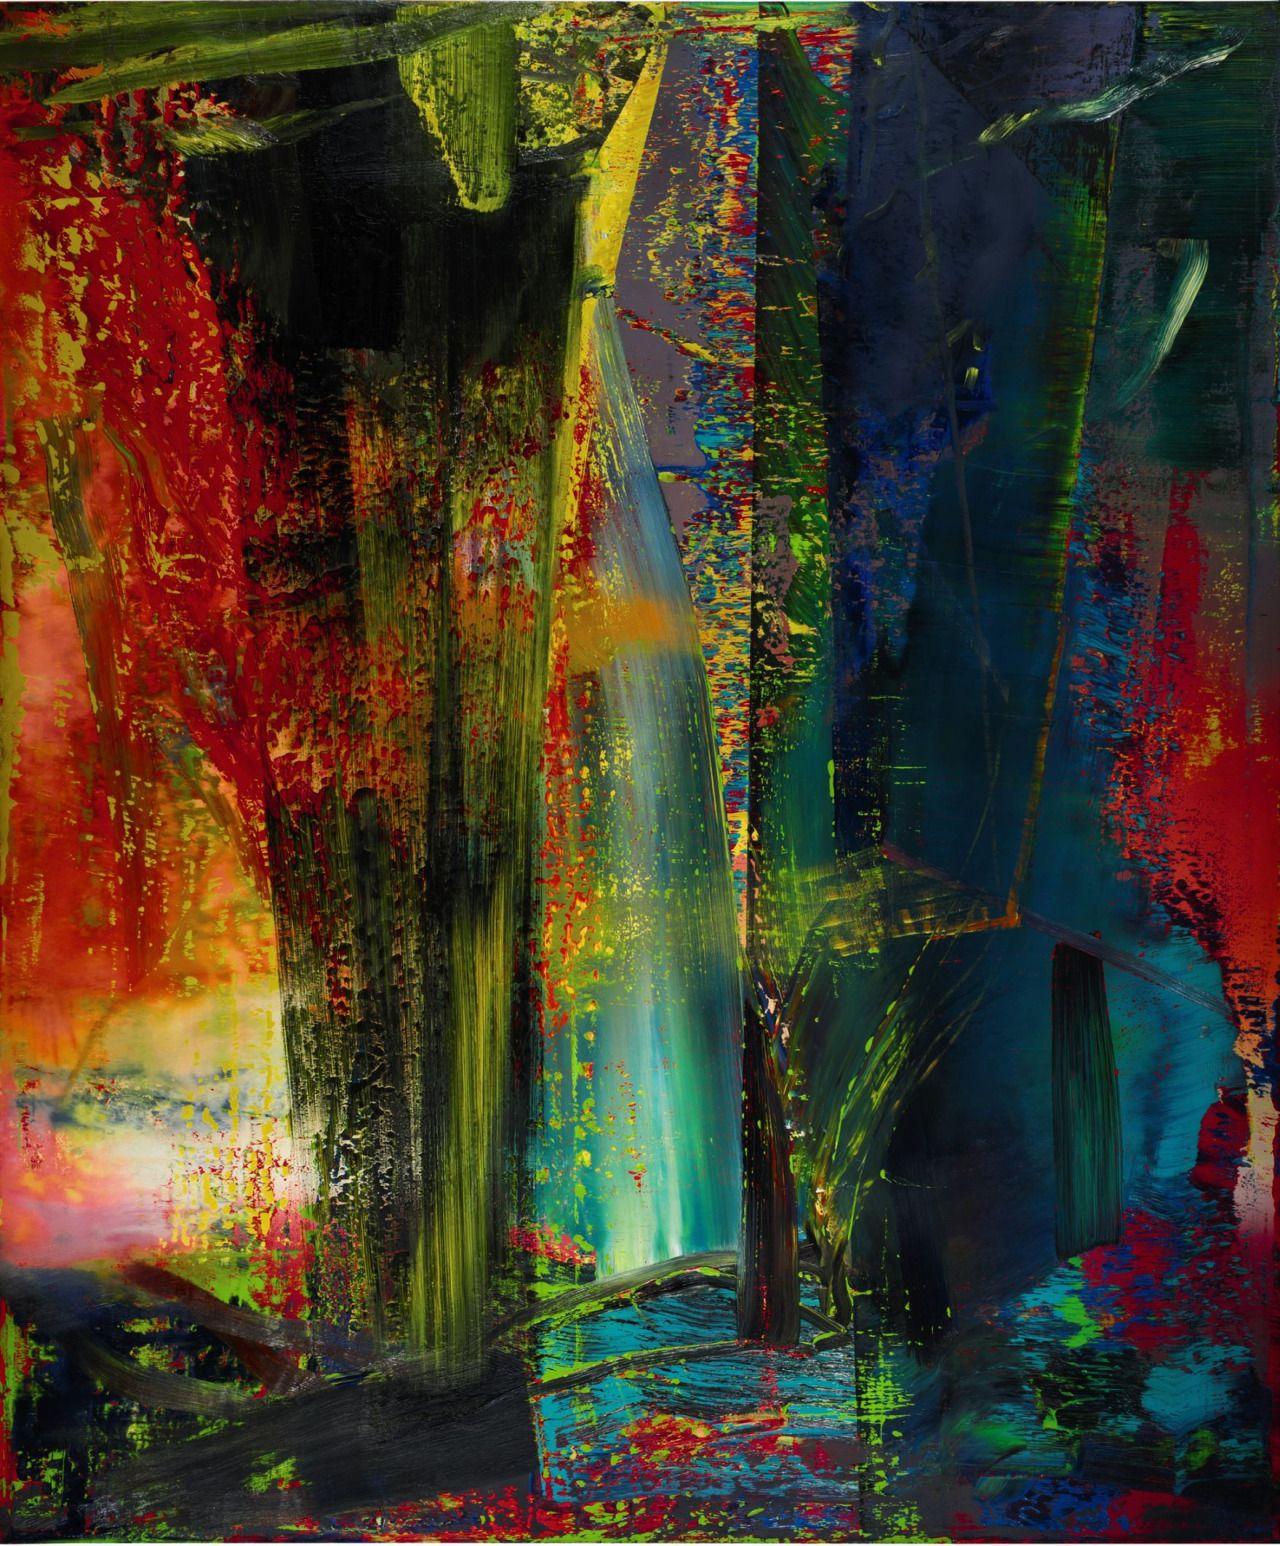 Gerhard Richter (b.1932), Abstraktes Bild (1986), oil on canvas, 250.5 x 300.5 cm. Via ArtNews.